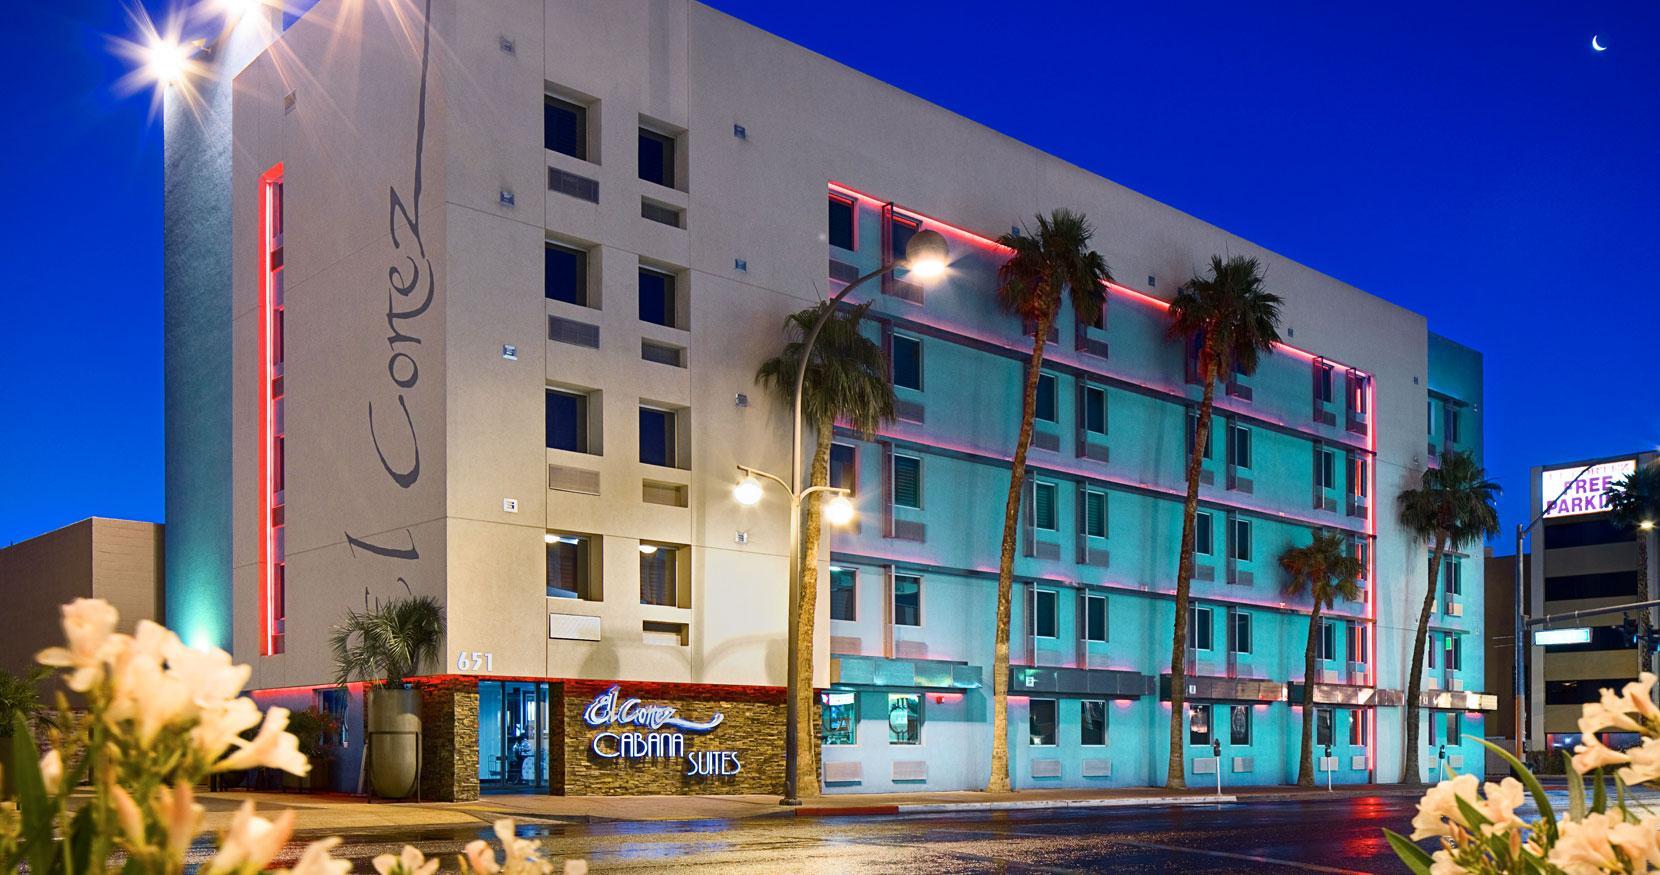 el cortez hotel and casino 43 2 2 7 las vegas hotel deals rh nz kayak com